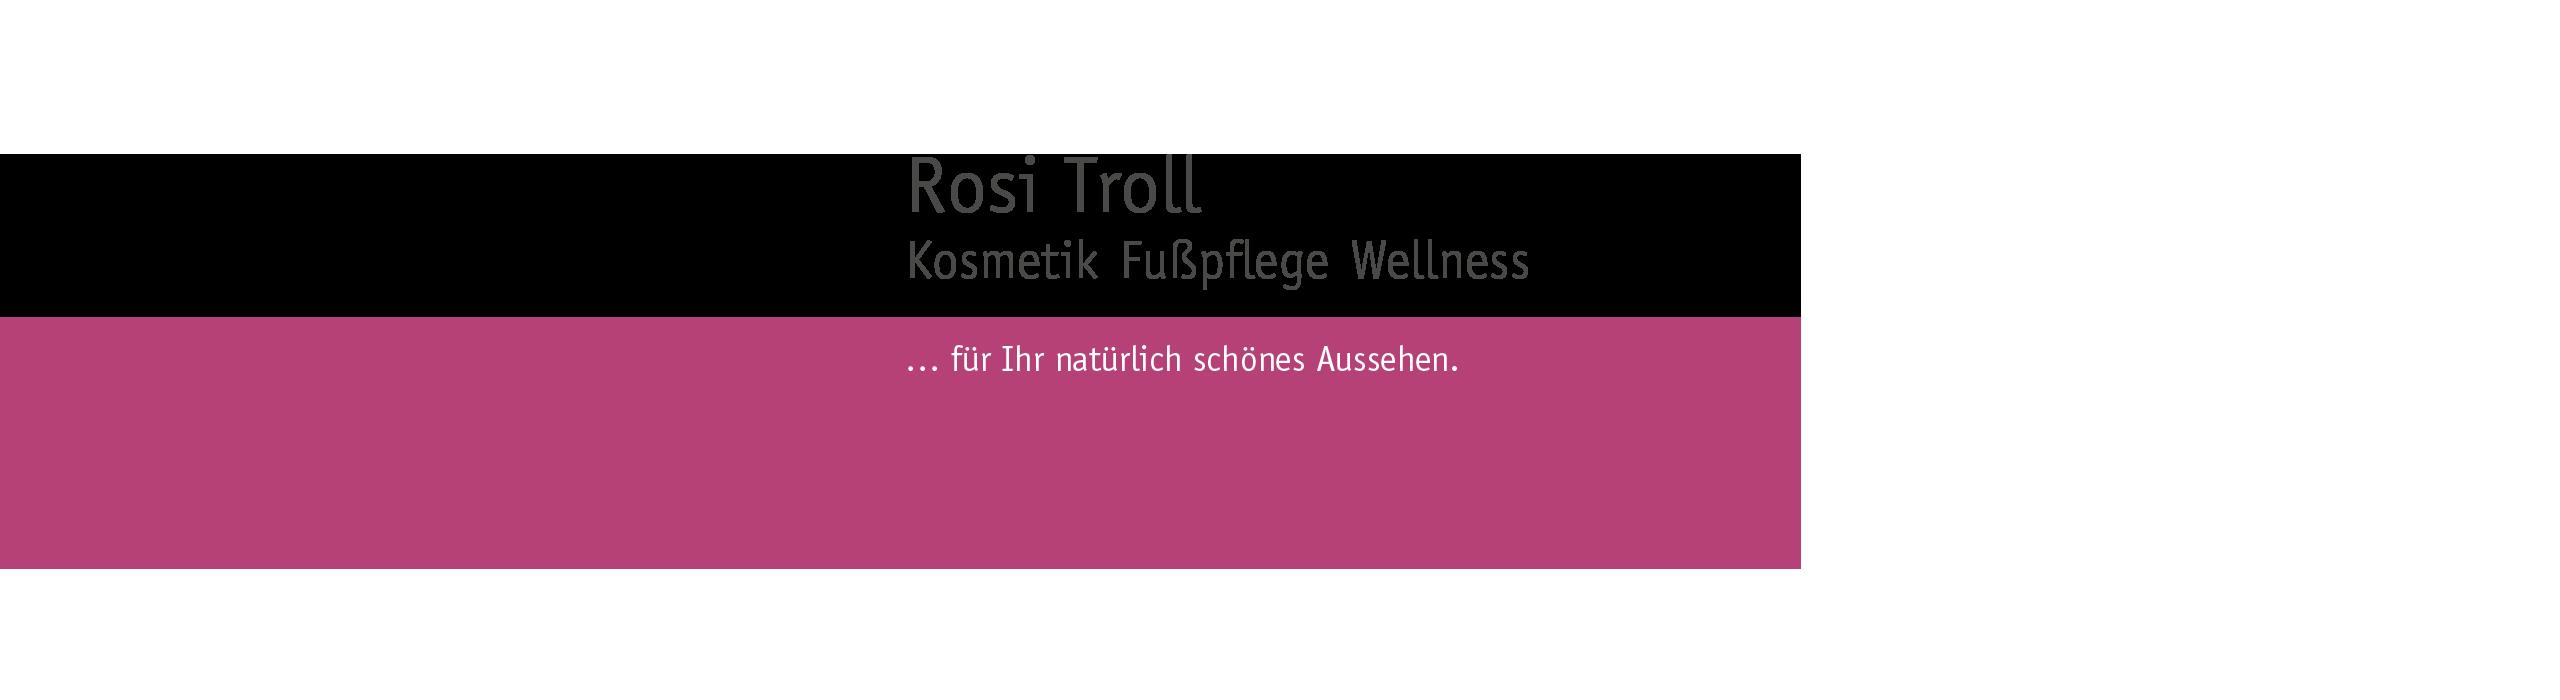 rosi_troll_logo